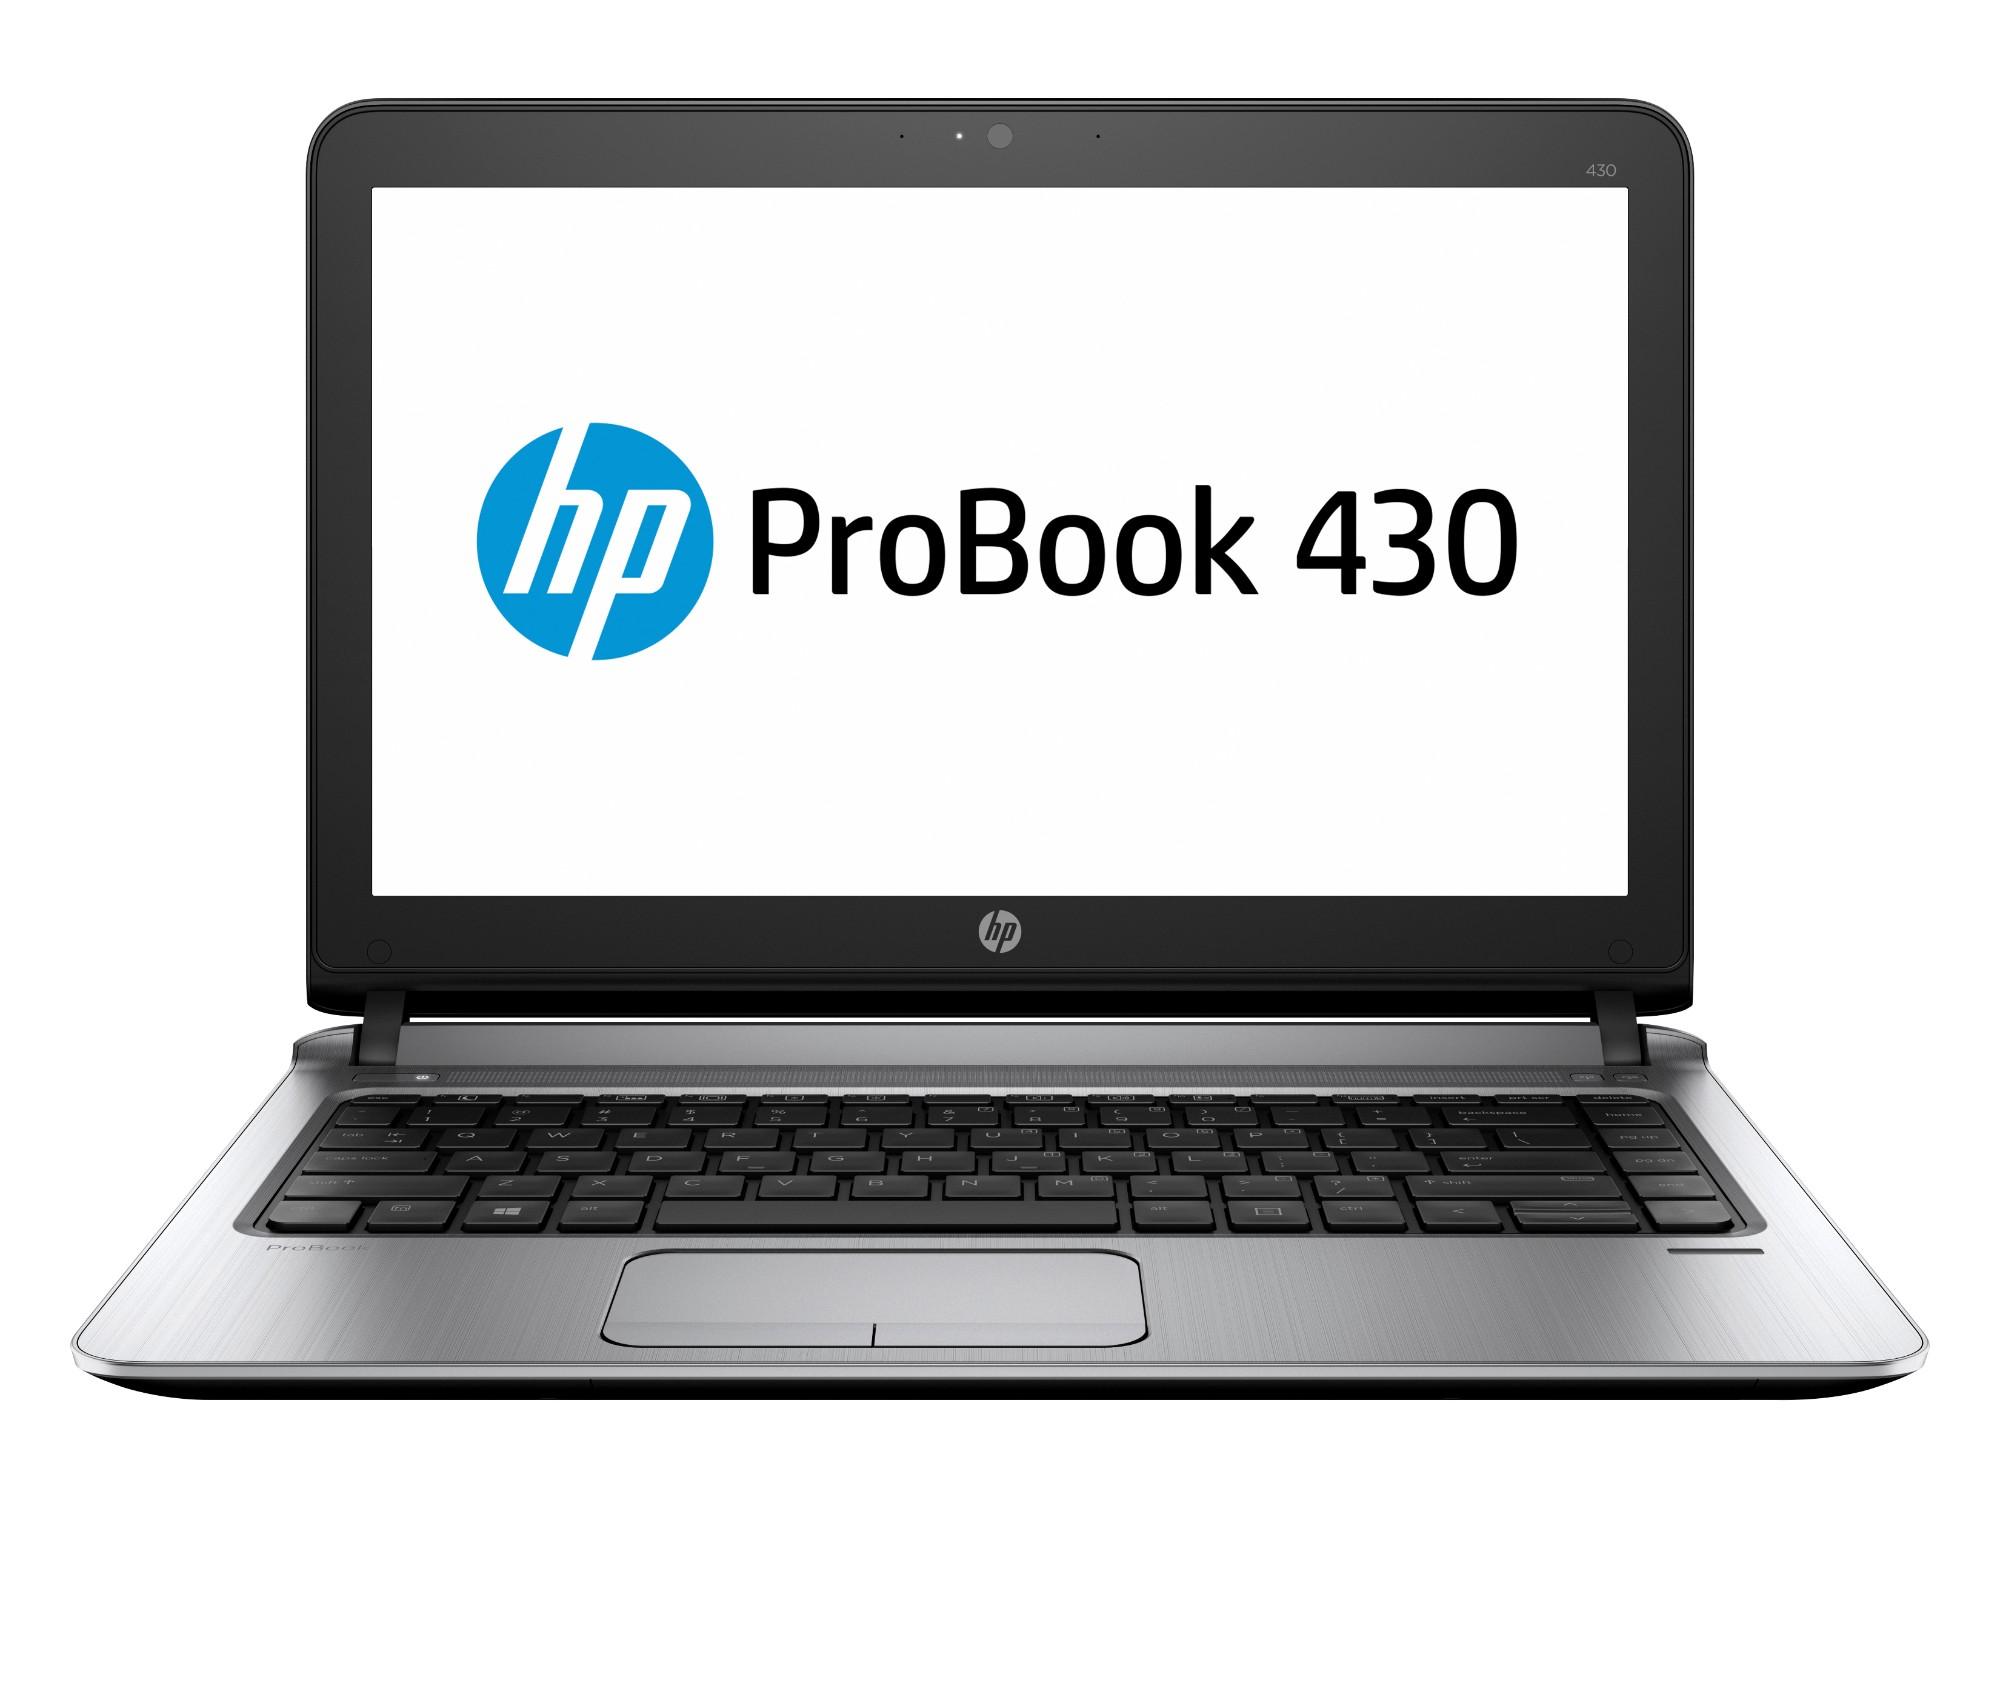 "HP ProBook 430 G3 Black,Silver Notebook 33.8 cm (13.3"") 1366 x 768 pixels 6th gen Intel® Core™ i5 i5-6200U 4 GB DDR4-SDRAM 500 GB HDD"